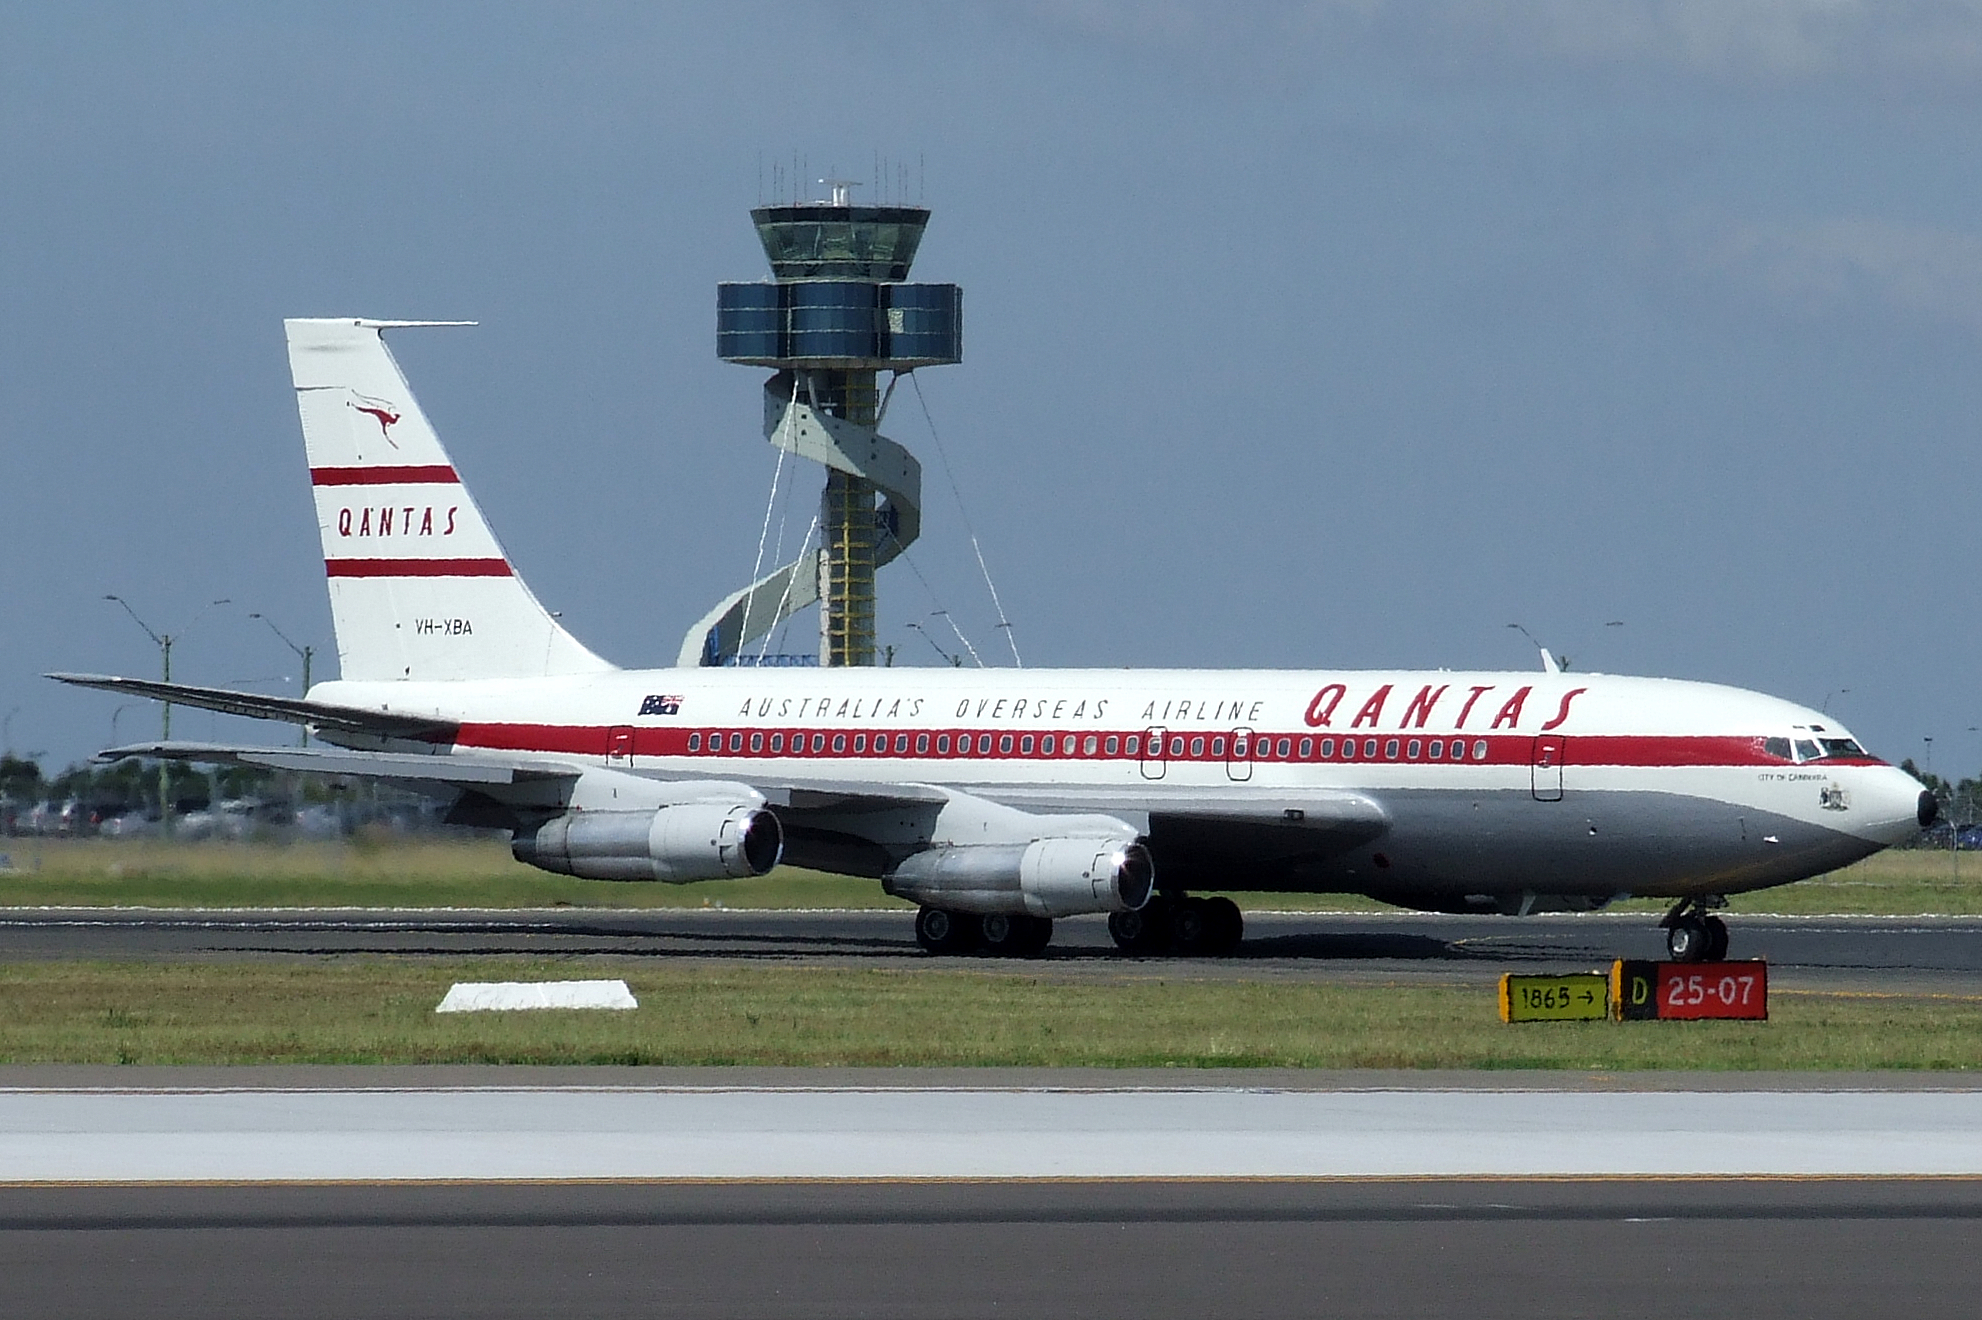 Boeing_707_Qantas_%28VH-XBA%29.jpg